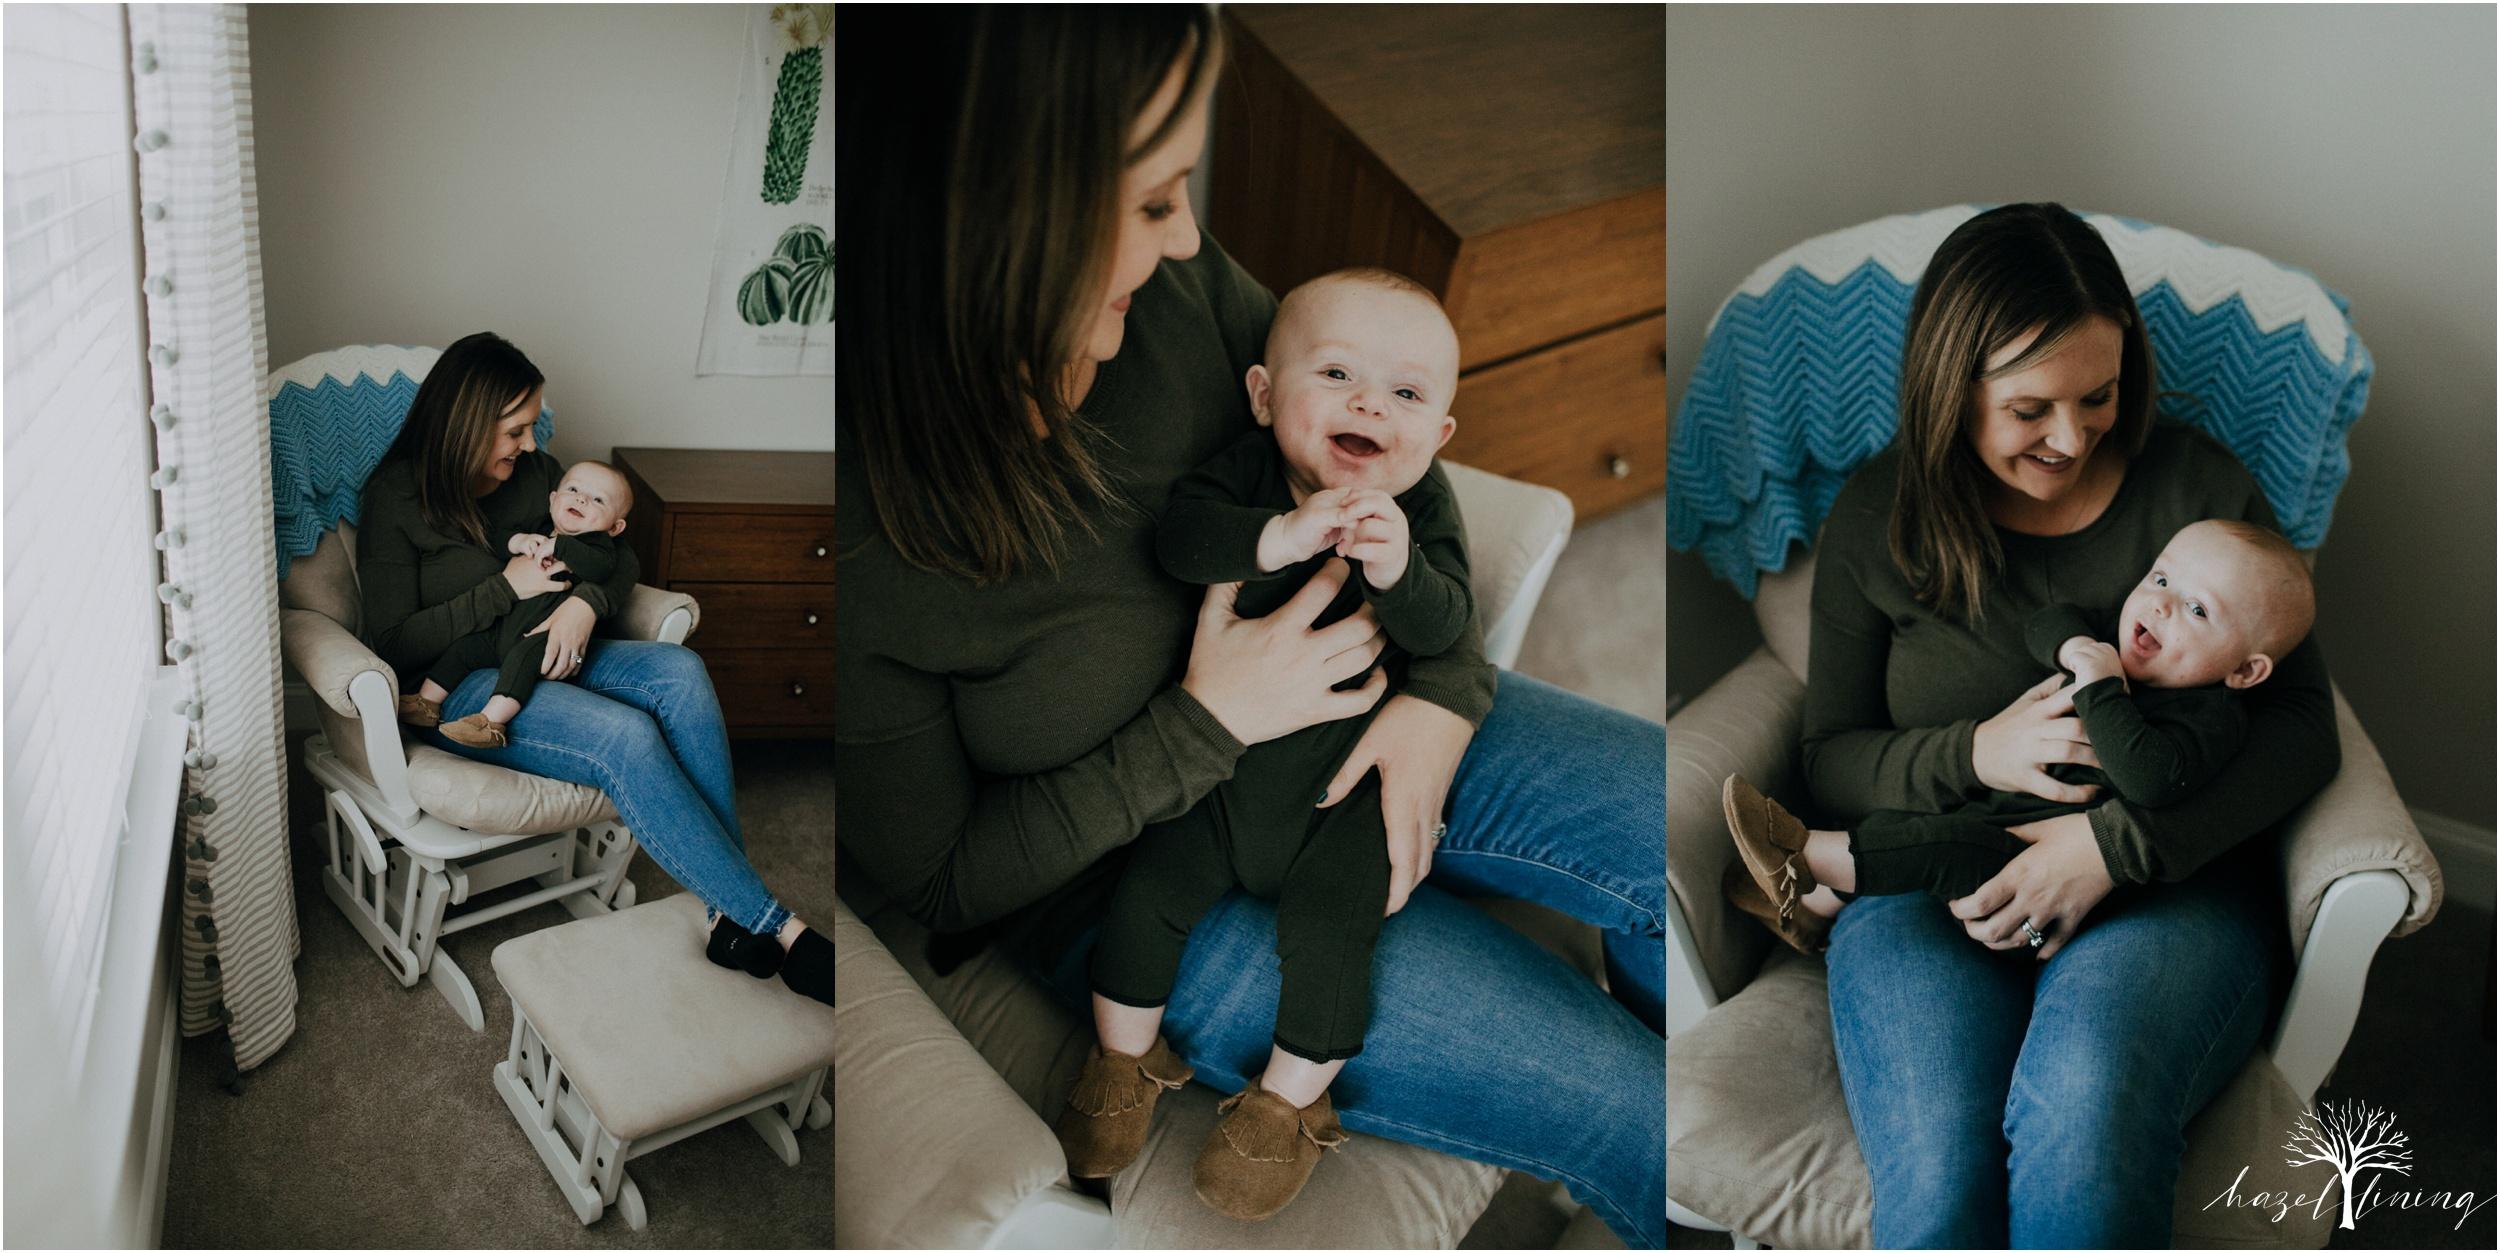 pellgrino-family-in-home-lifestyle-family-portraits_0029.jpg